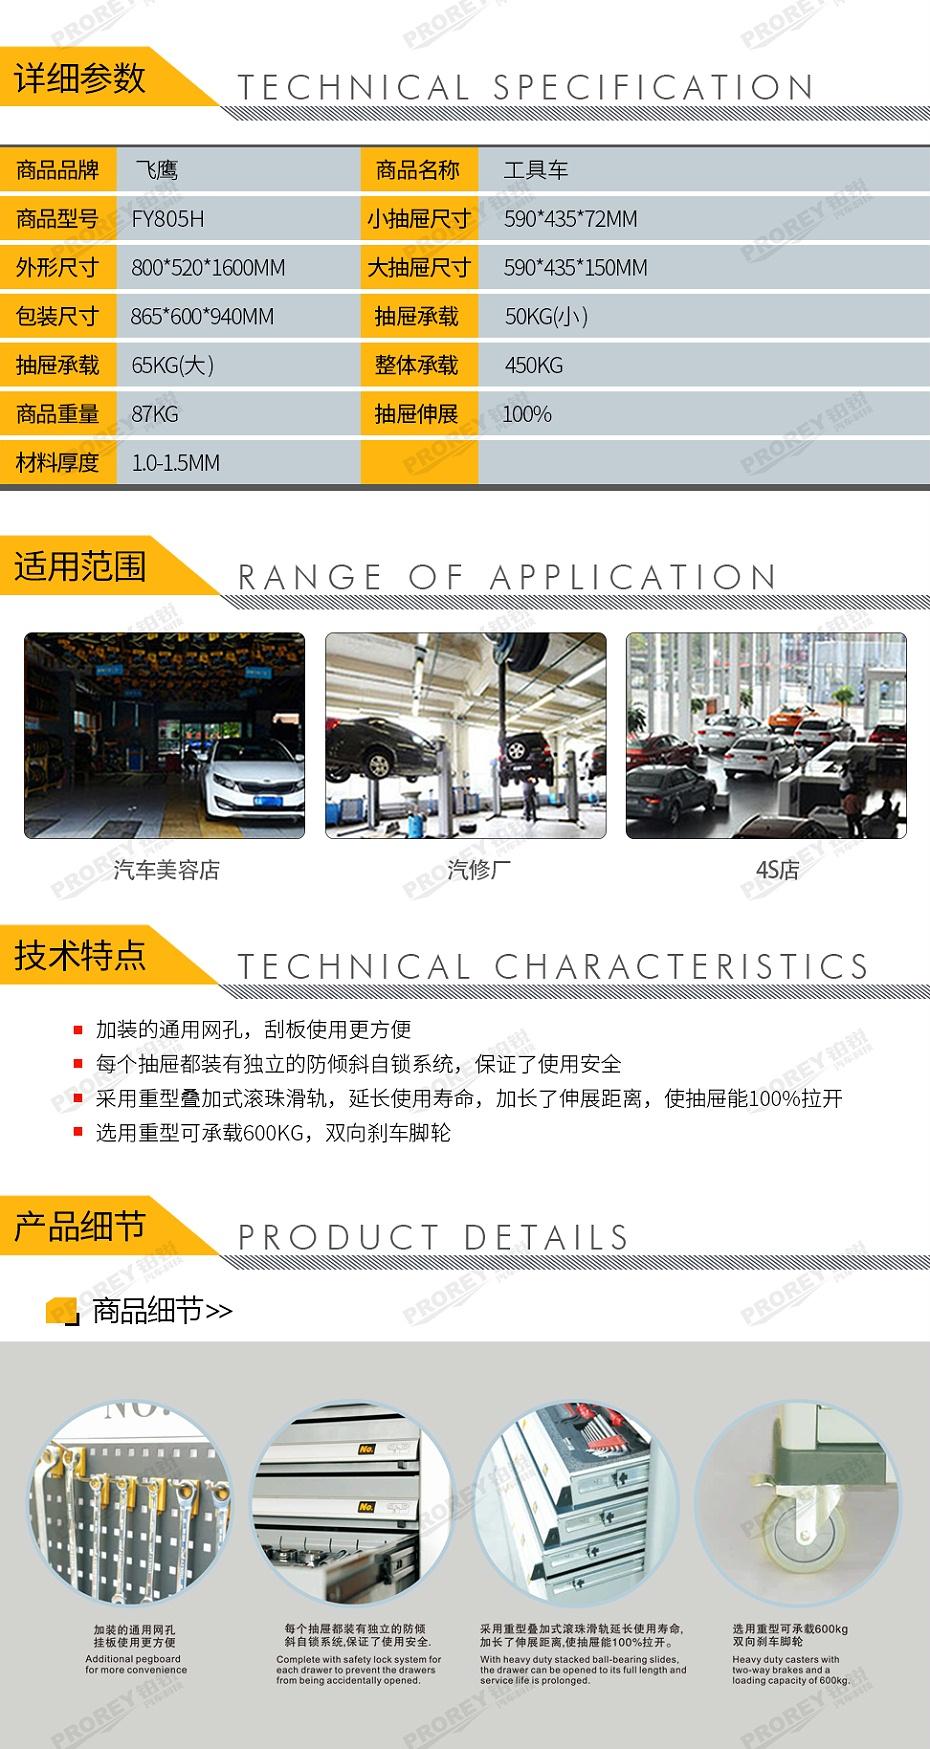 GW-130030519-飞鹰 FY805h 工具车-2